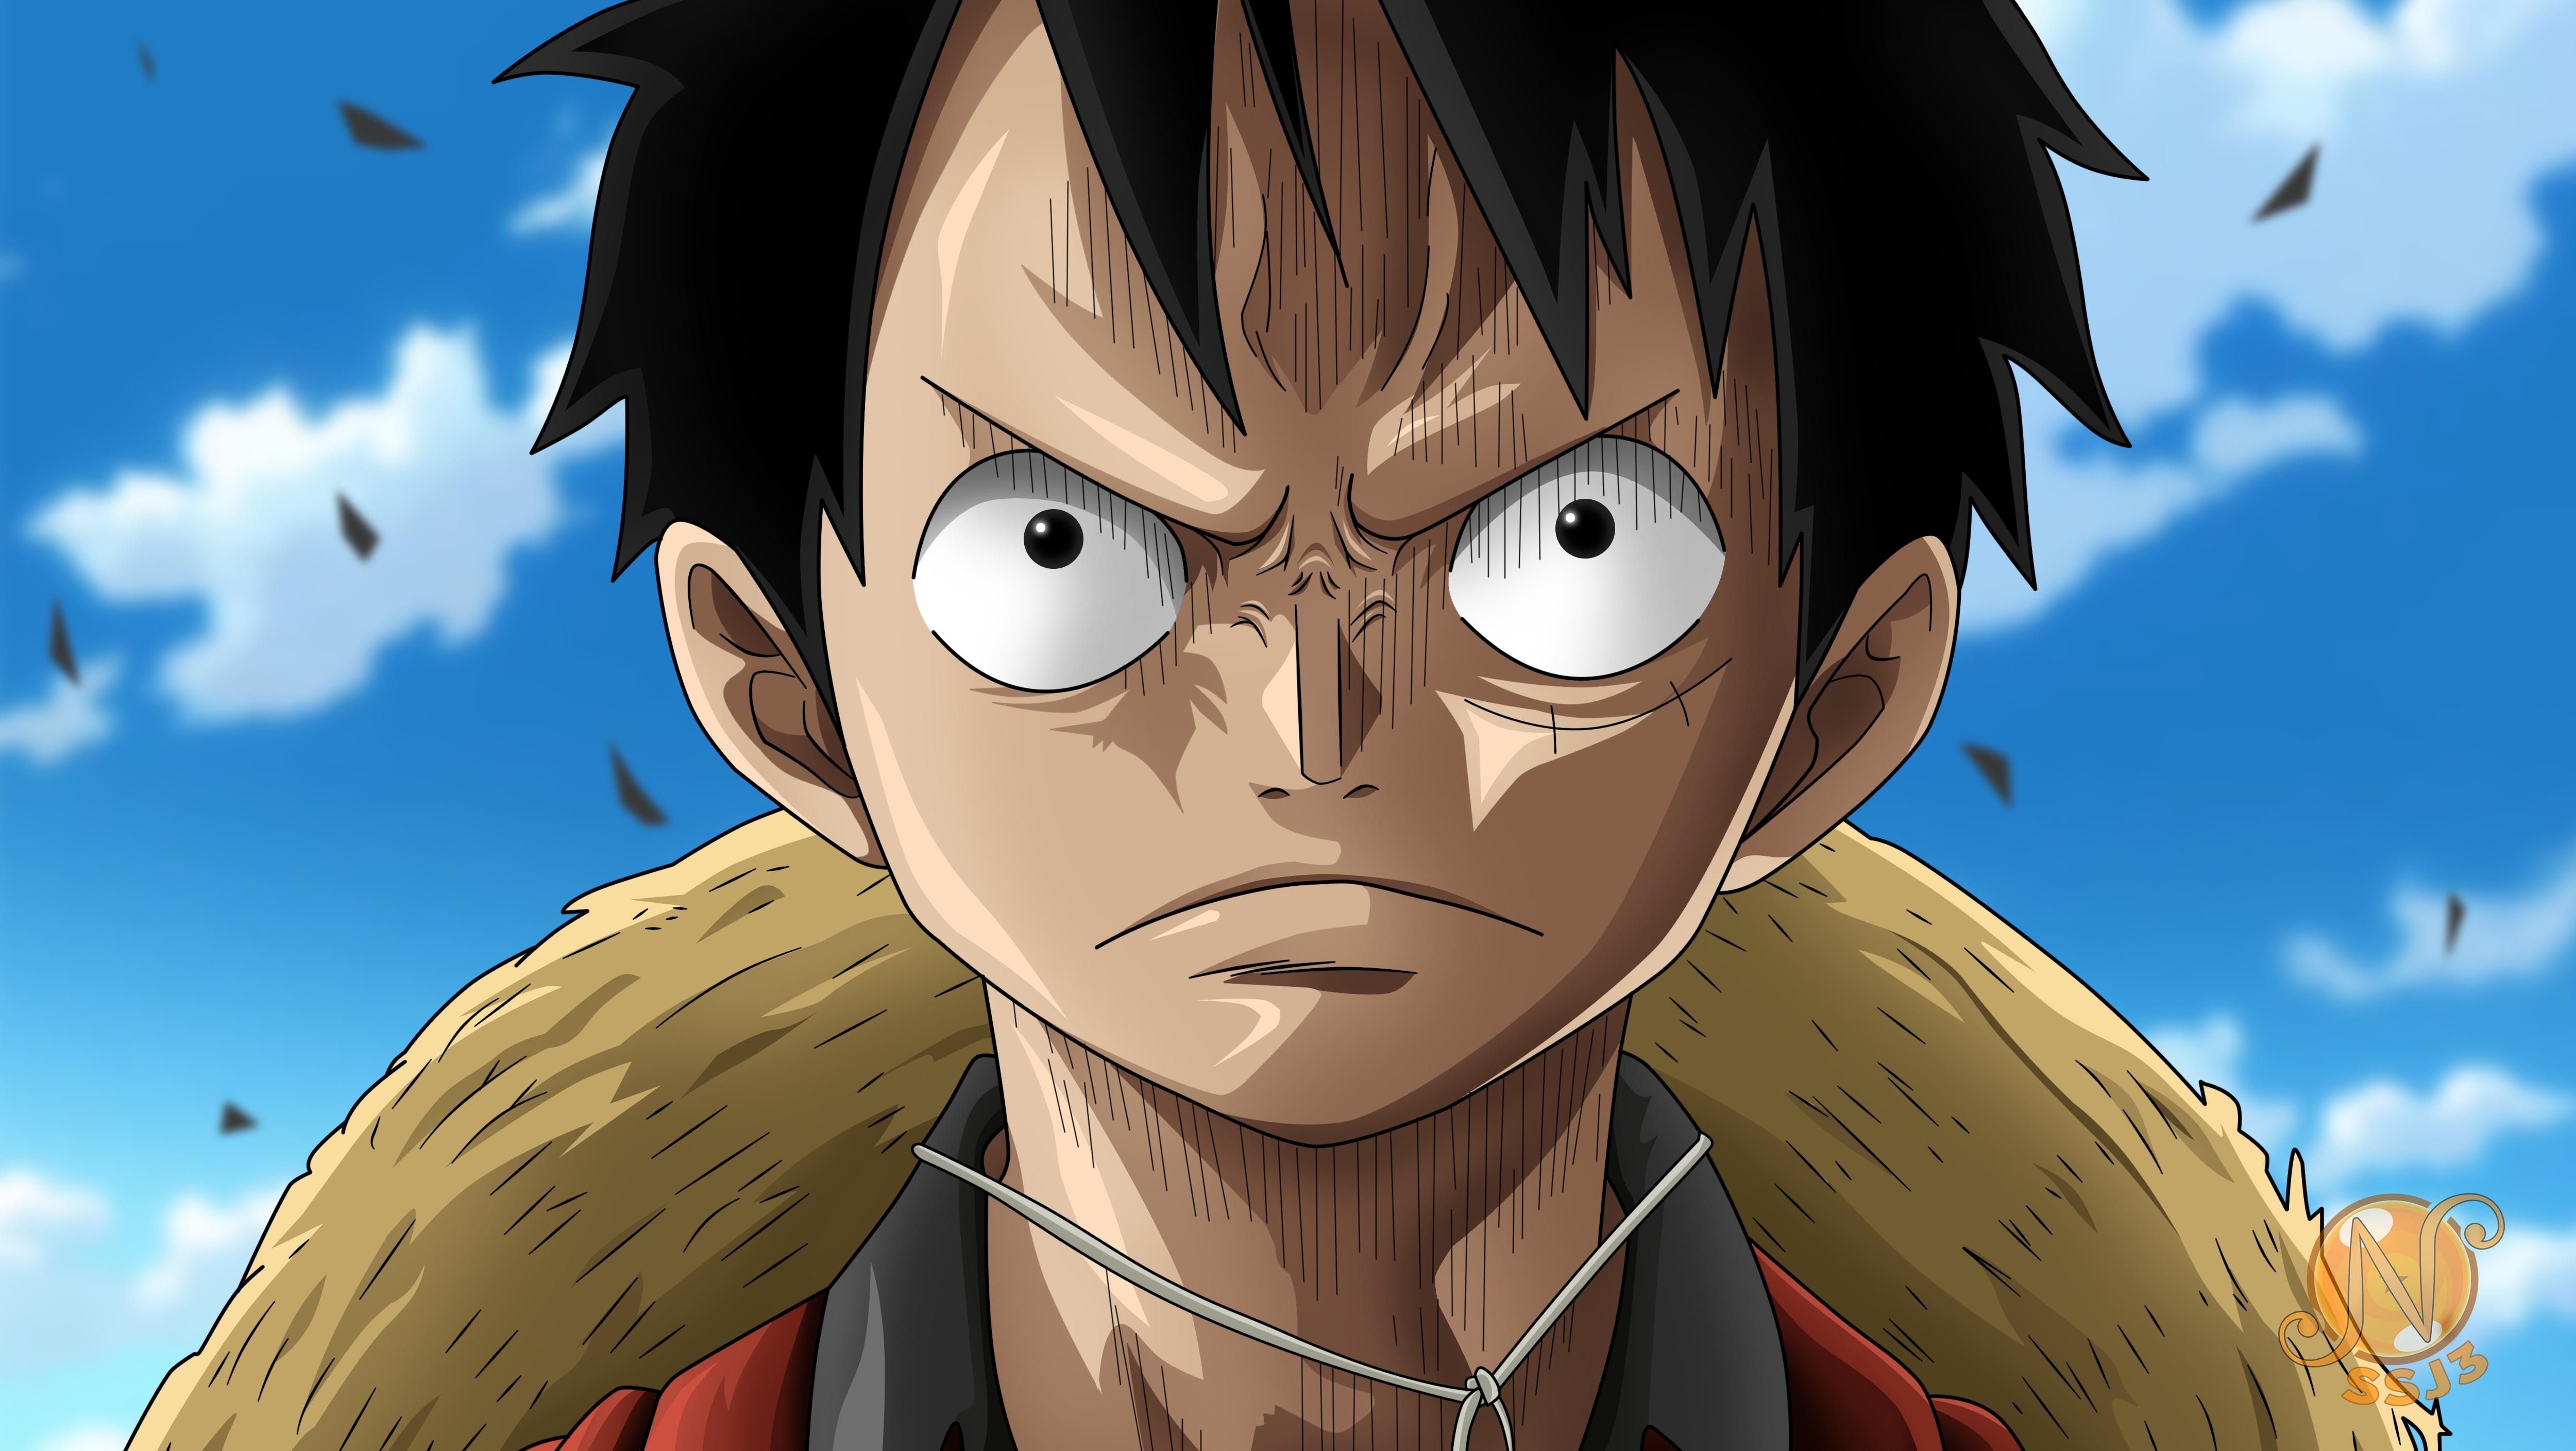 One Piece Episode 888 - HD Wallpaper